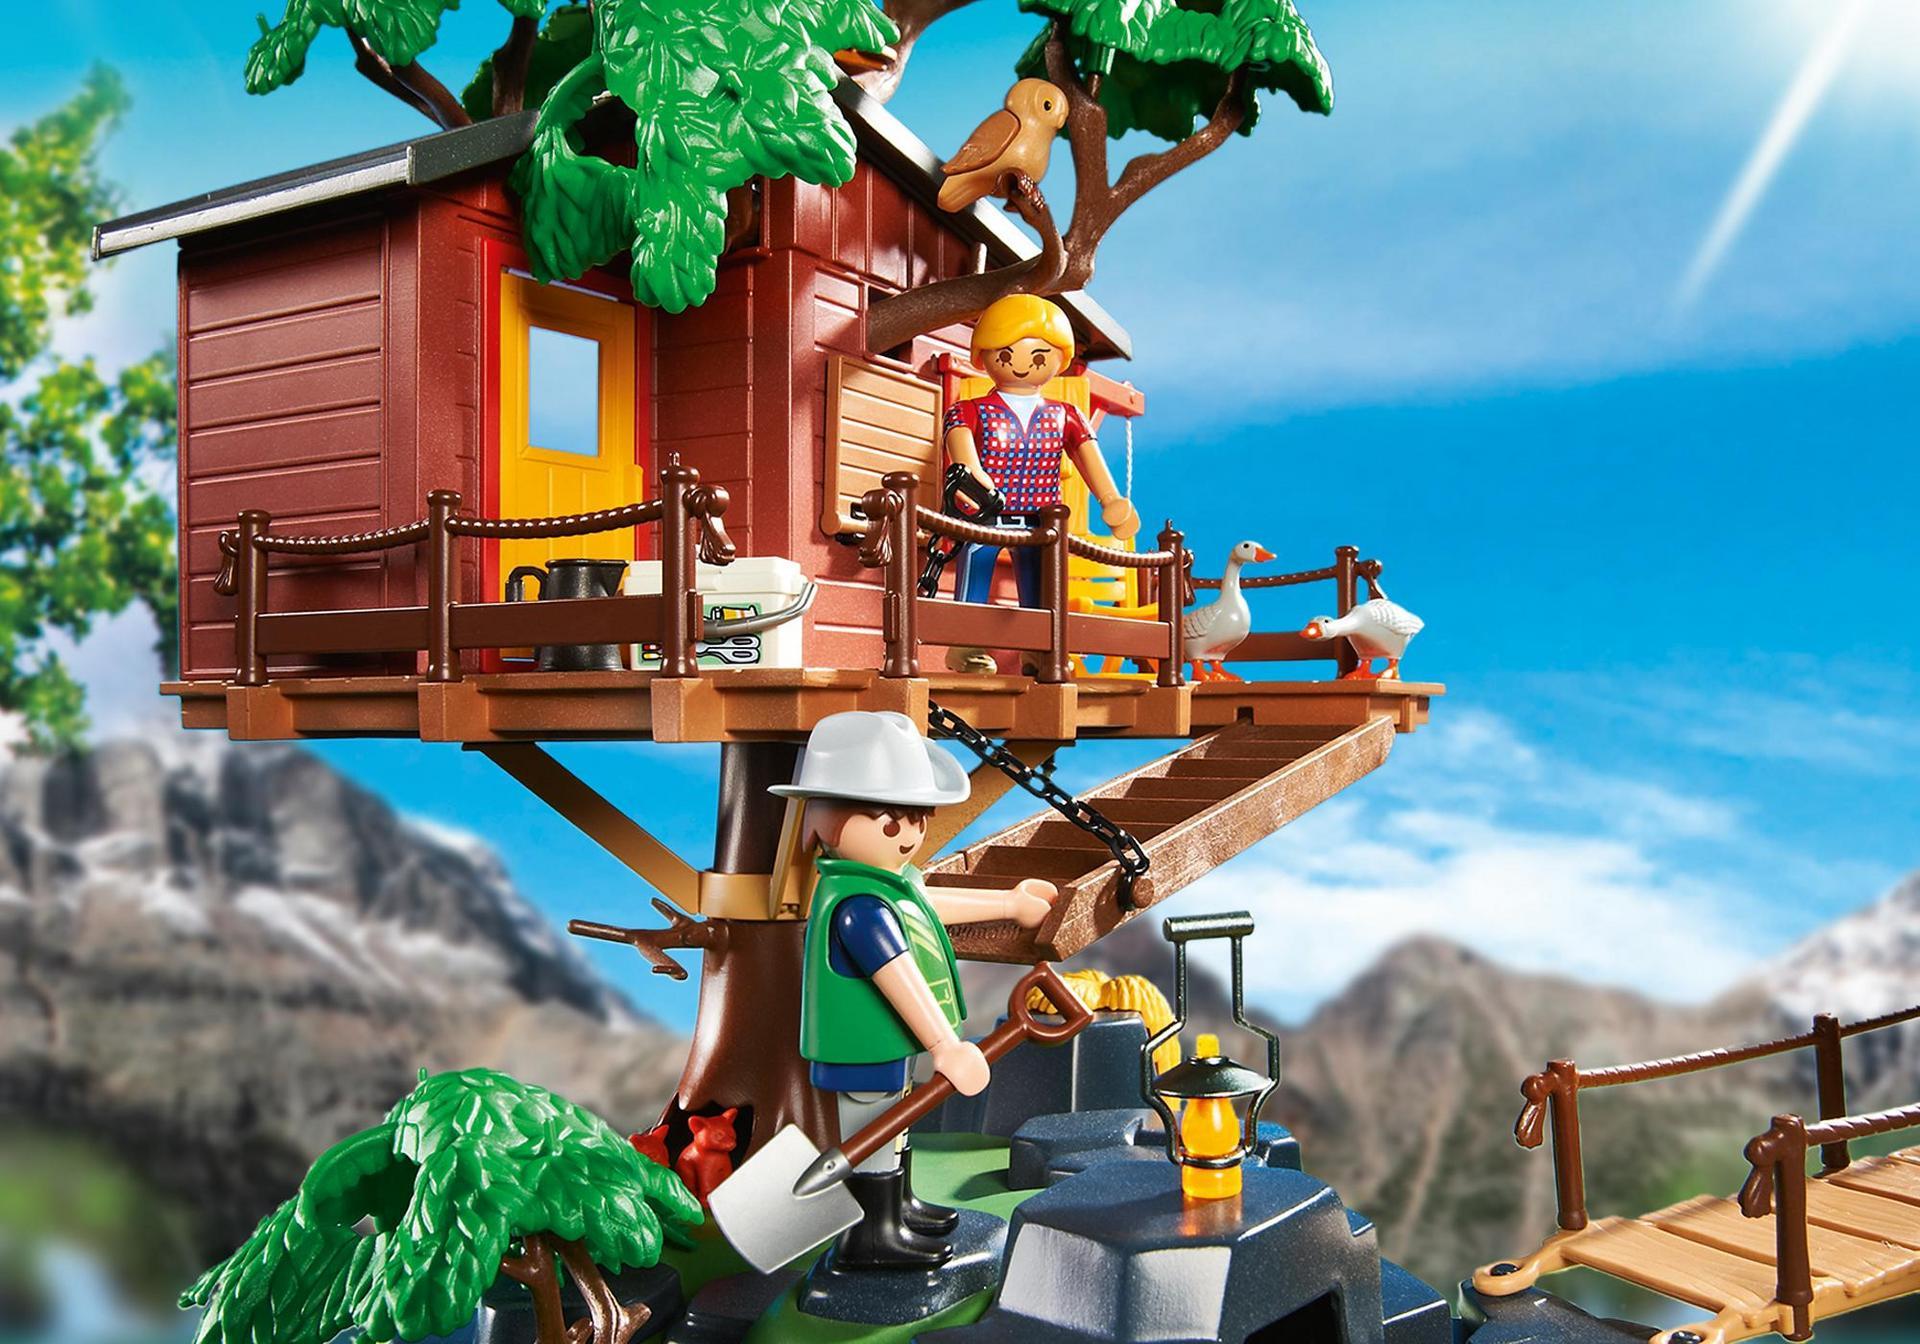 Abenteuer baumhaus 5557 playmobil deutschland for La casa de playmobil